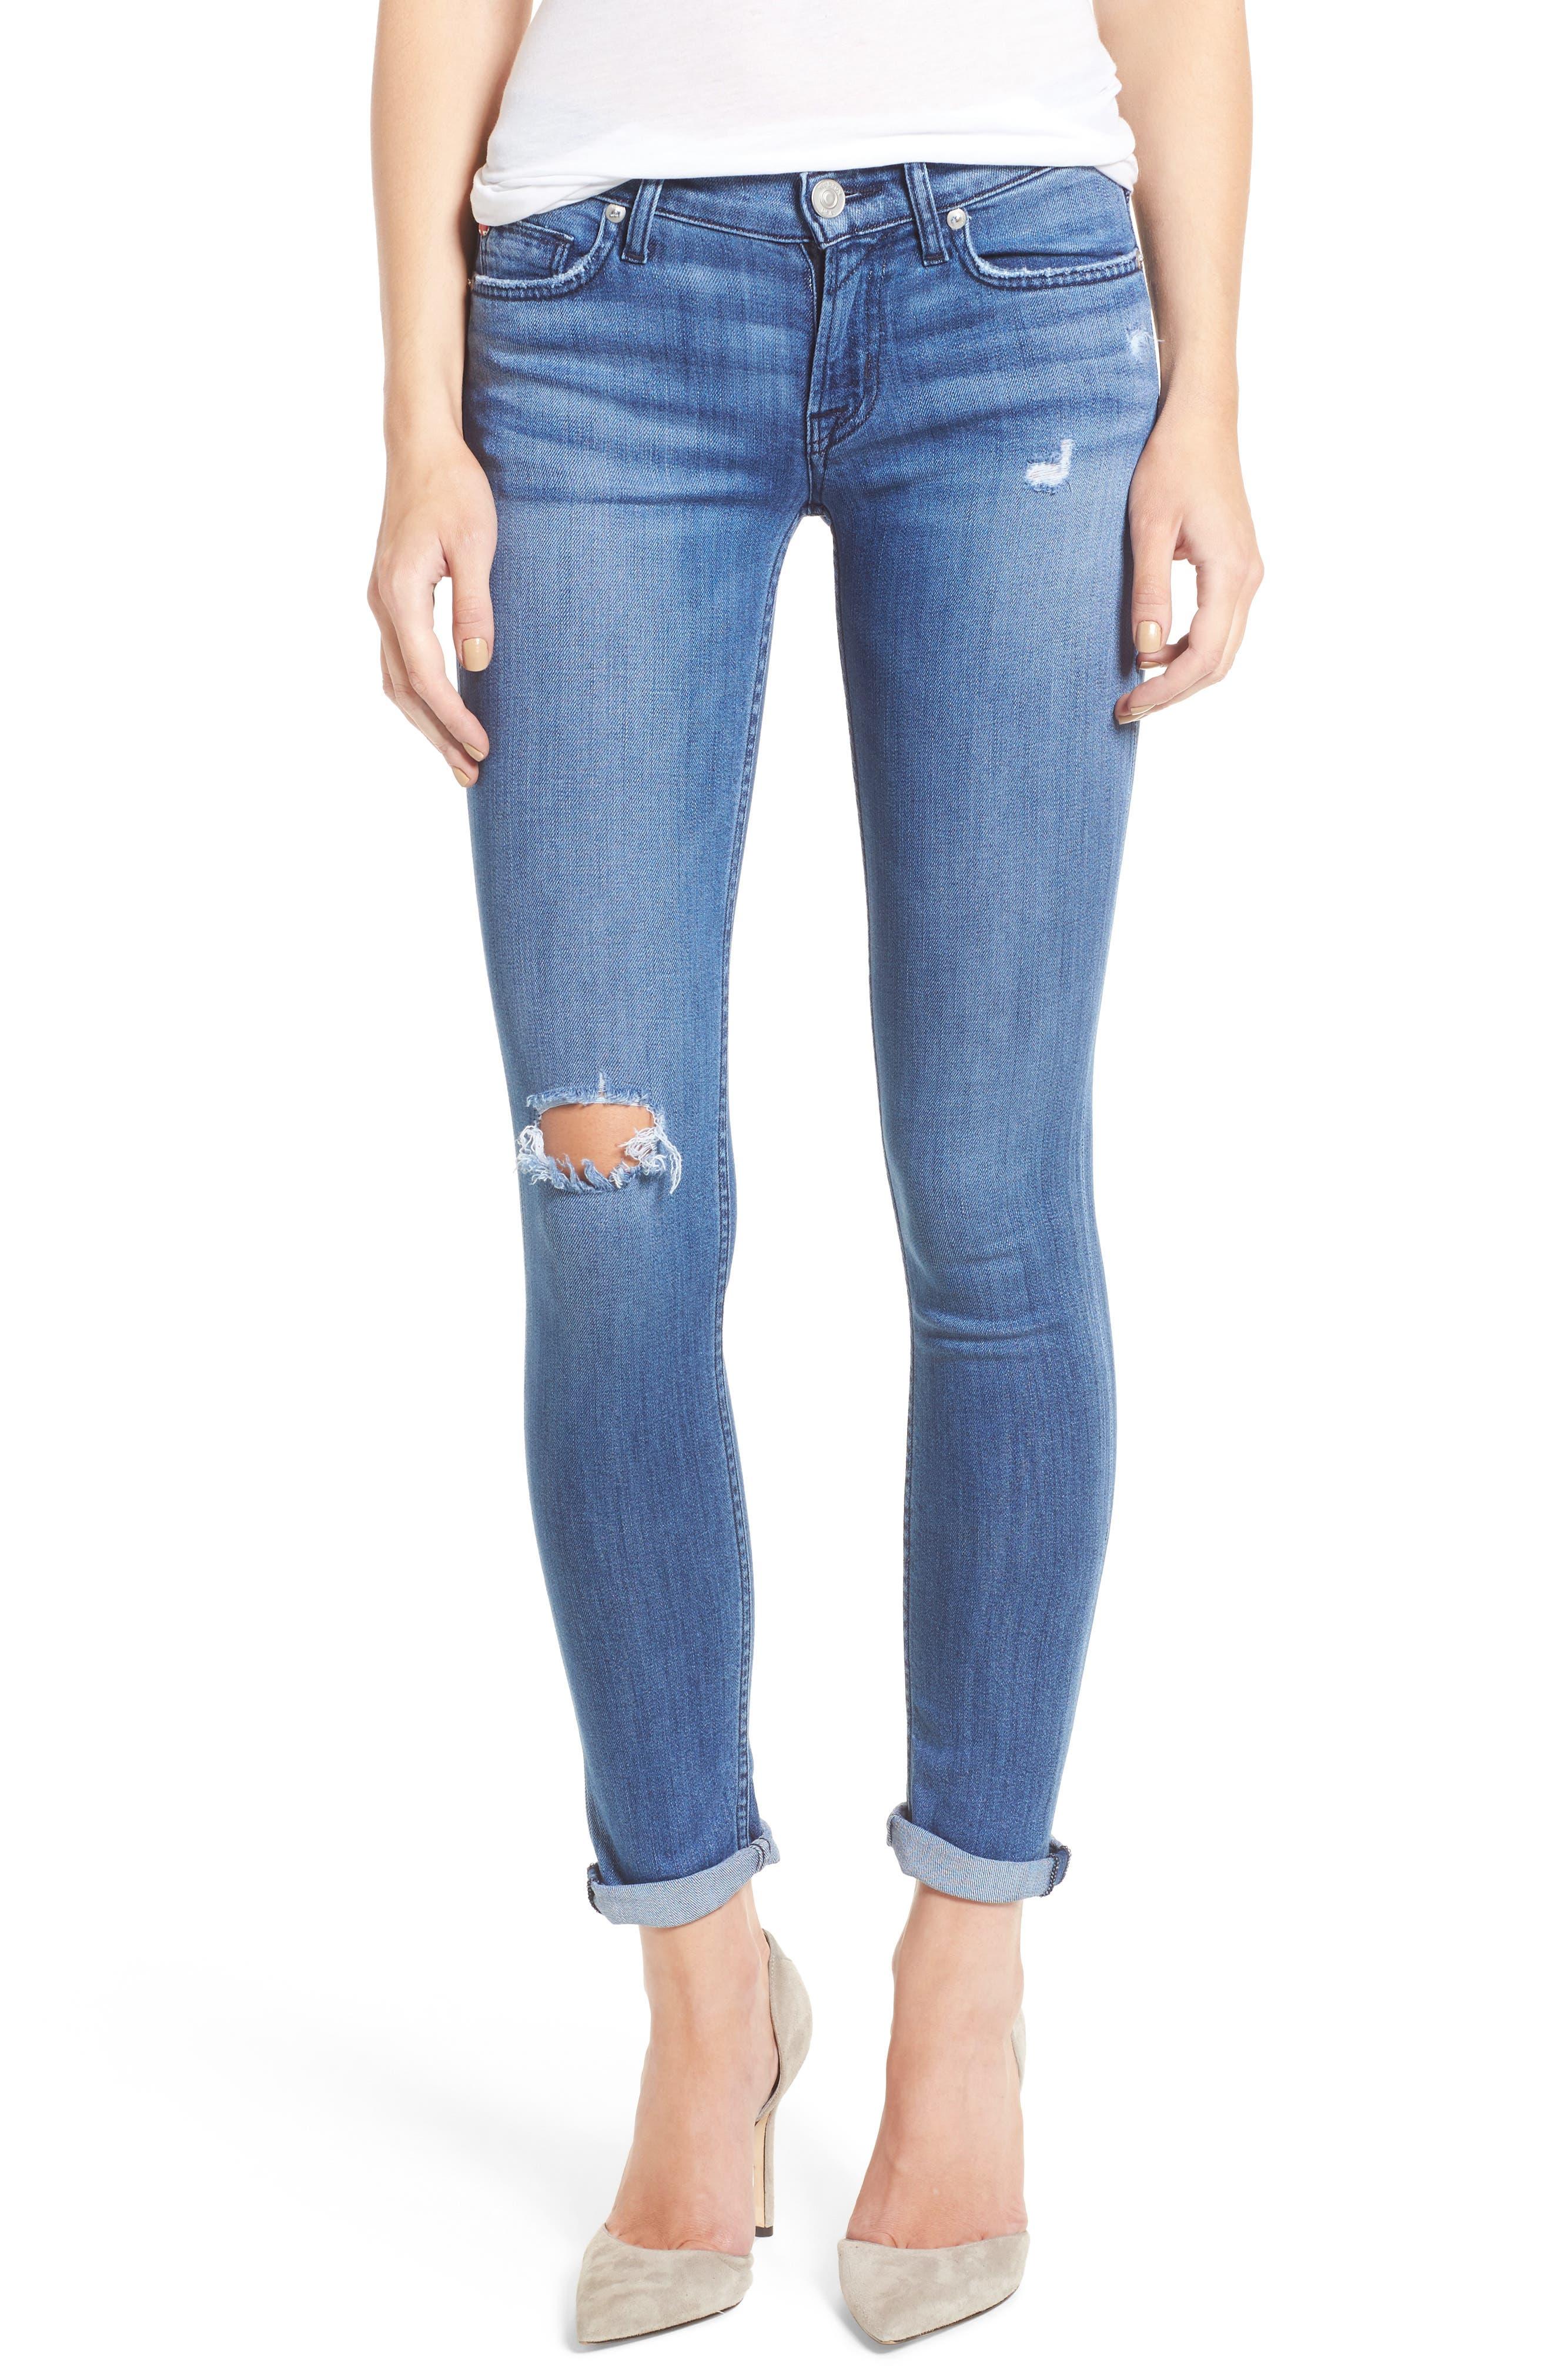 Main Image - Hudson Tally Crop Skinny Jeans (Encounter)